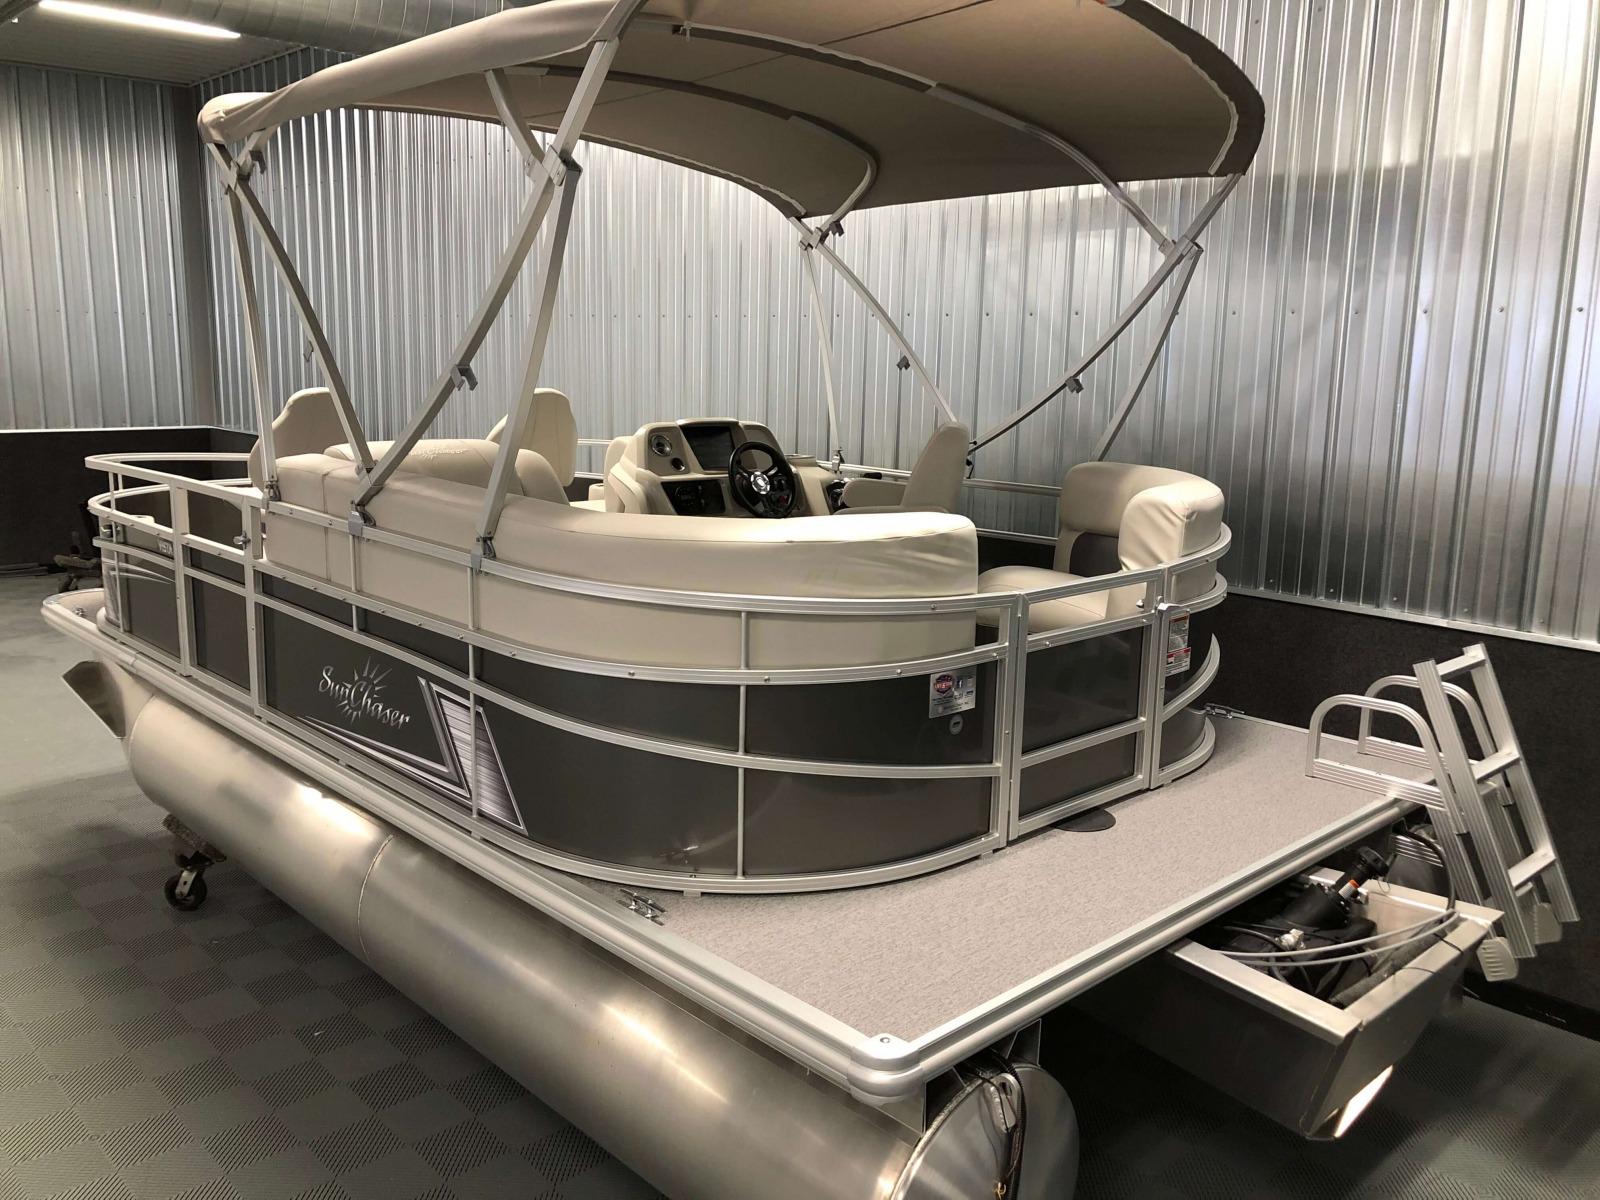 Rear Swim Deck of a 2020 SunChaser Vista 18 Fish Pontoon Boat